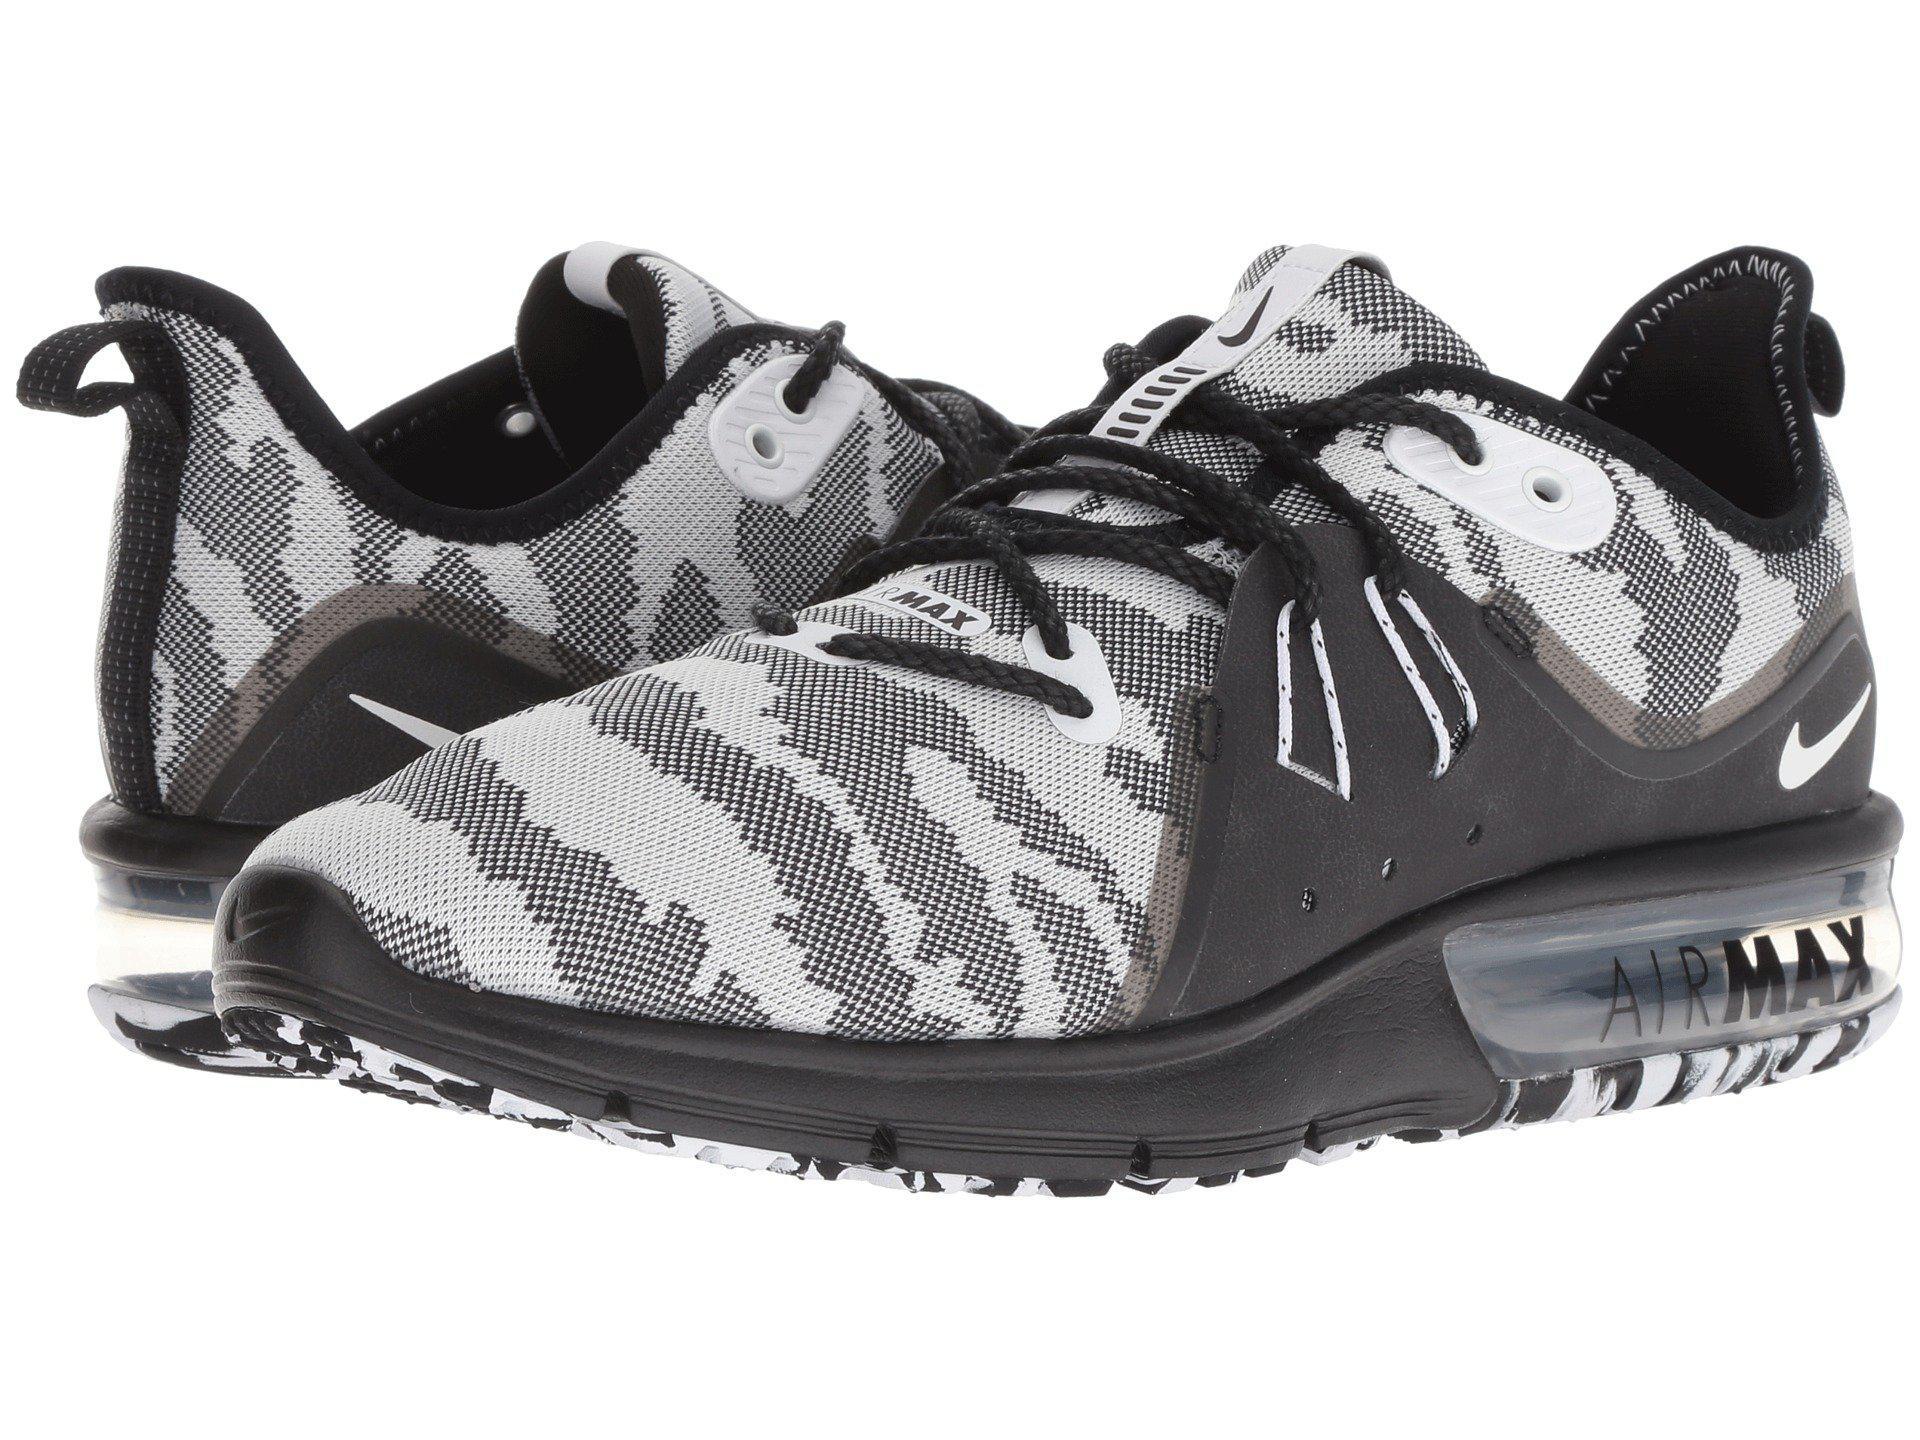 34ccdfa20d Nike Air Max Sequent 3 Premium in Black for Men - Lyst